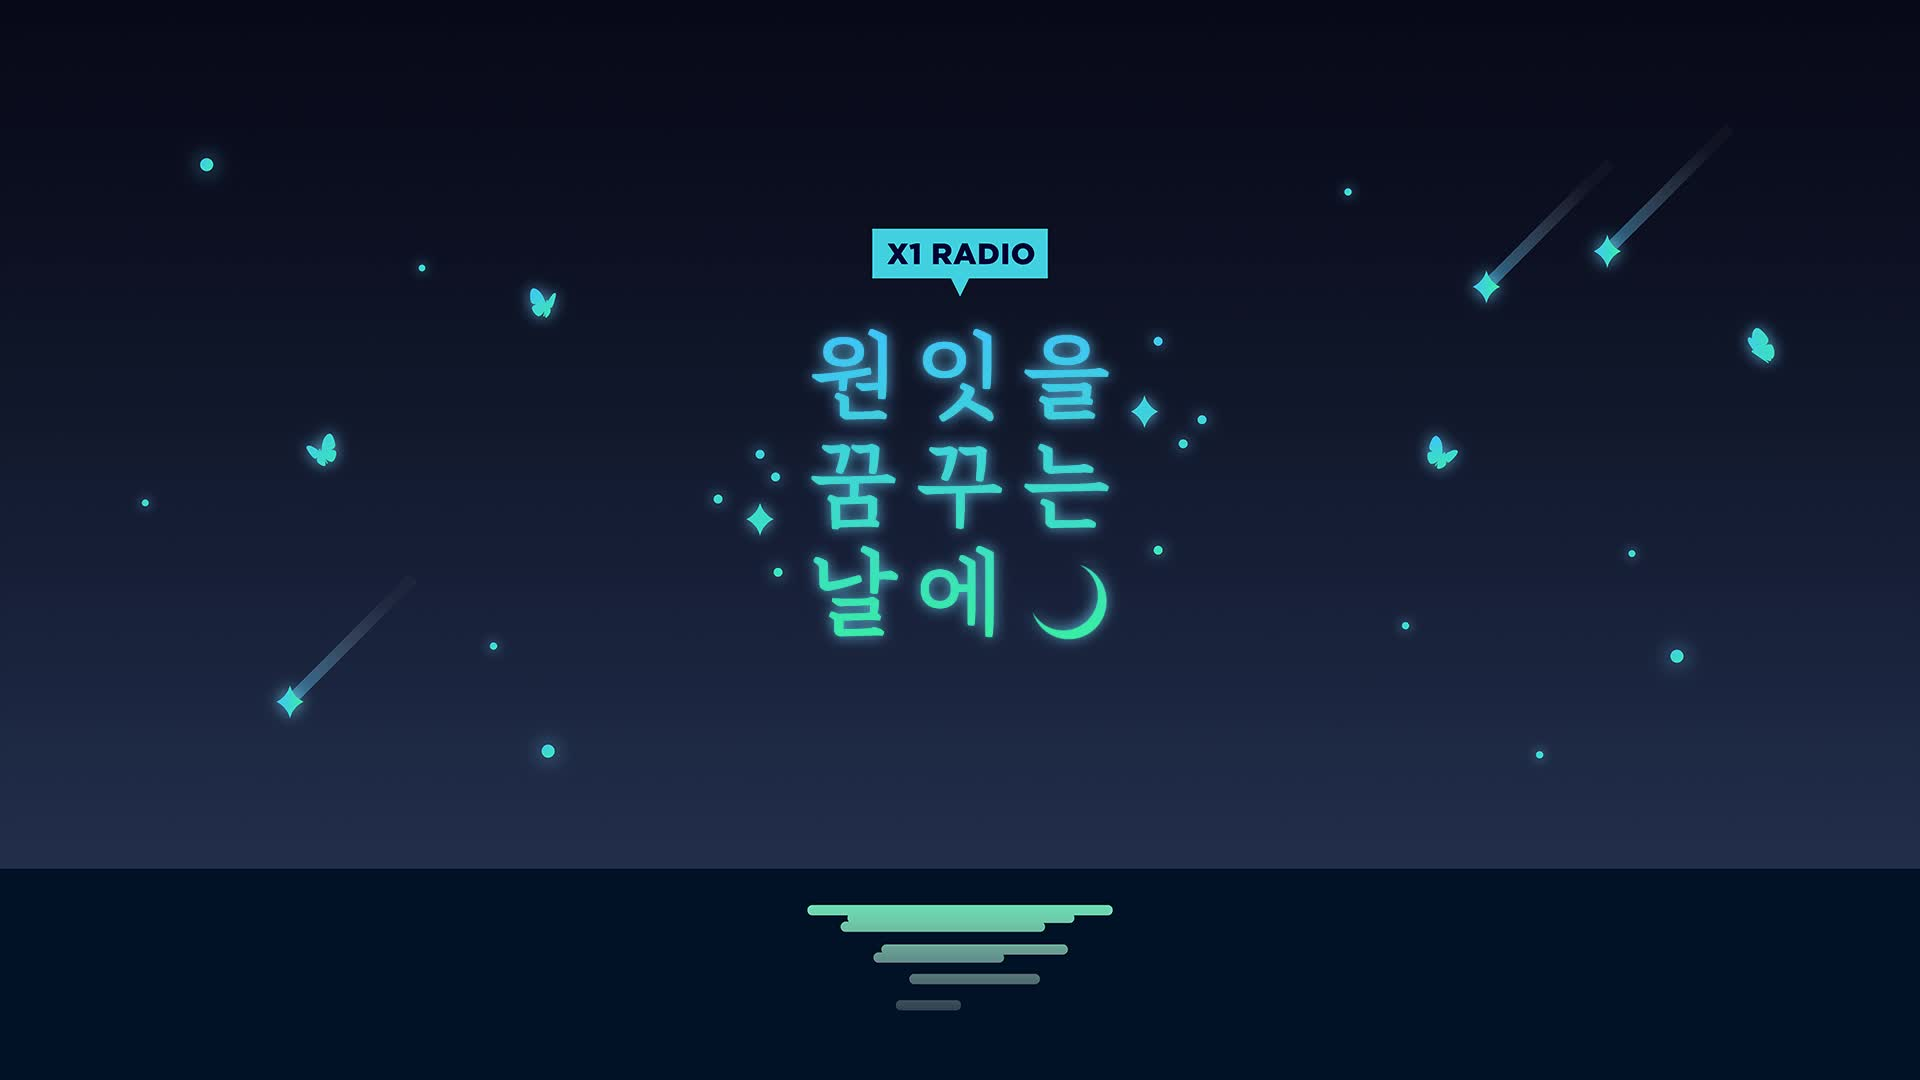 [X1 RADIO] '원잇을 꿈꾸는 날에' EP.1 - 프롤로그